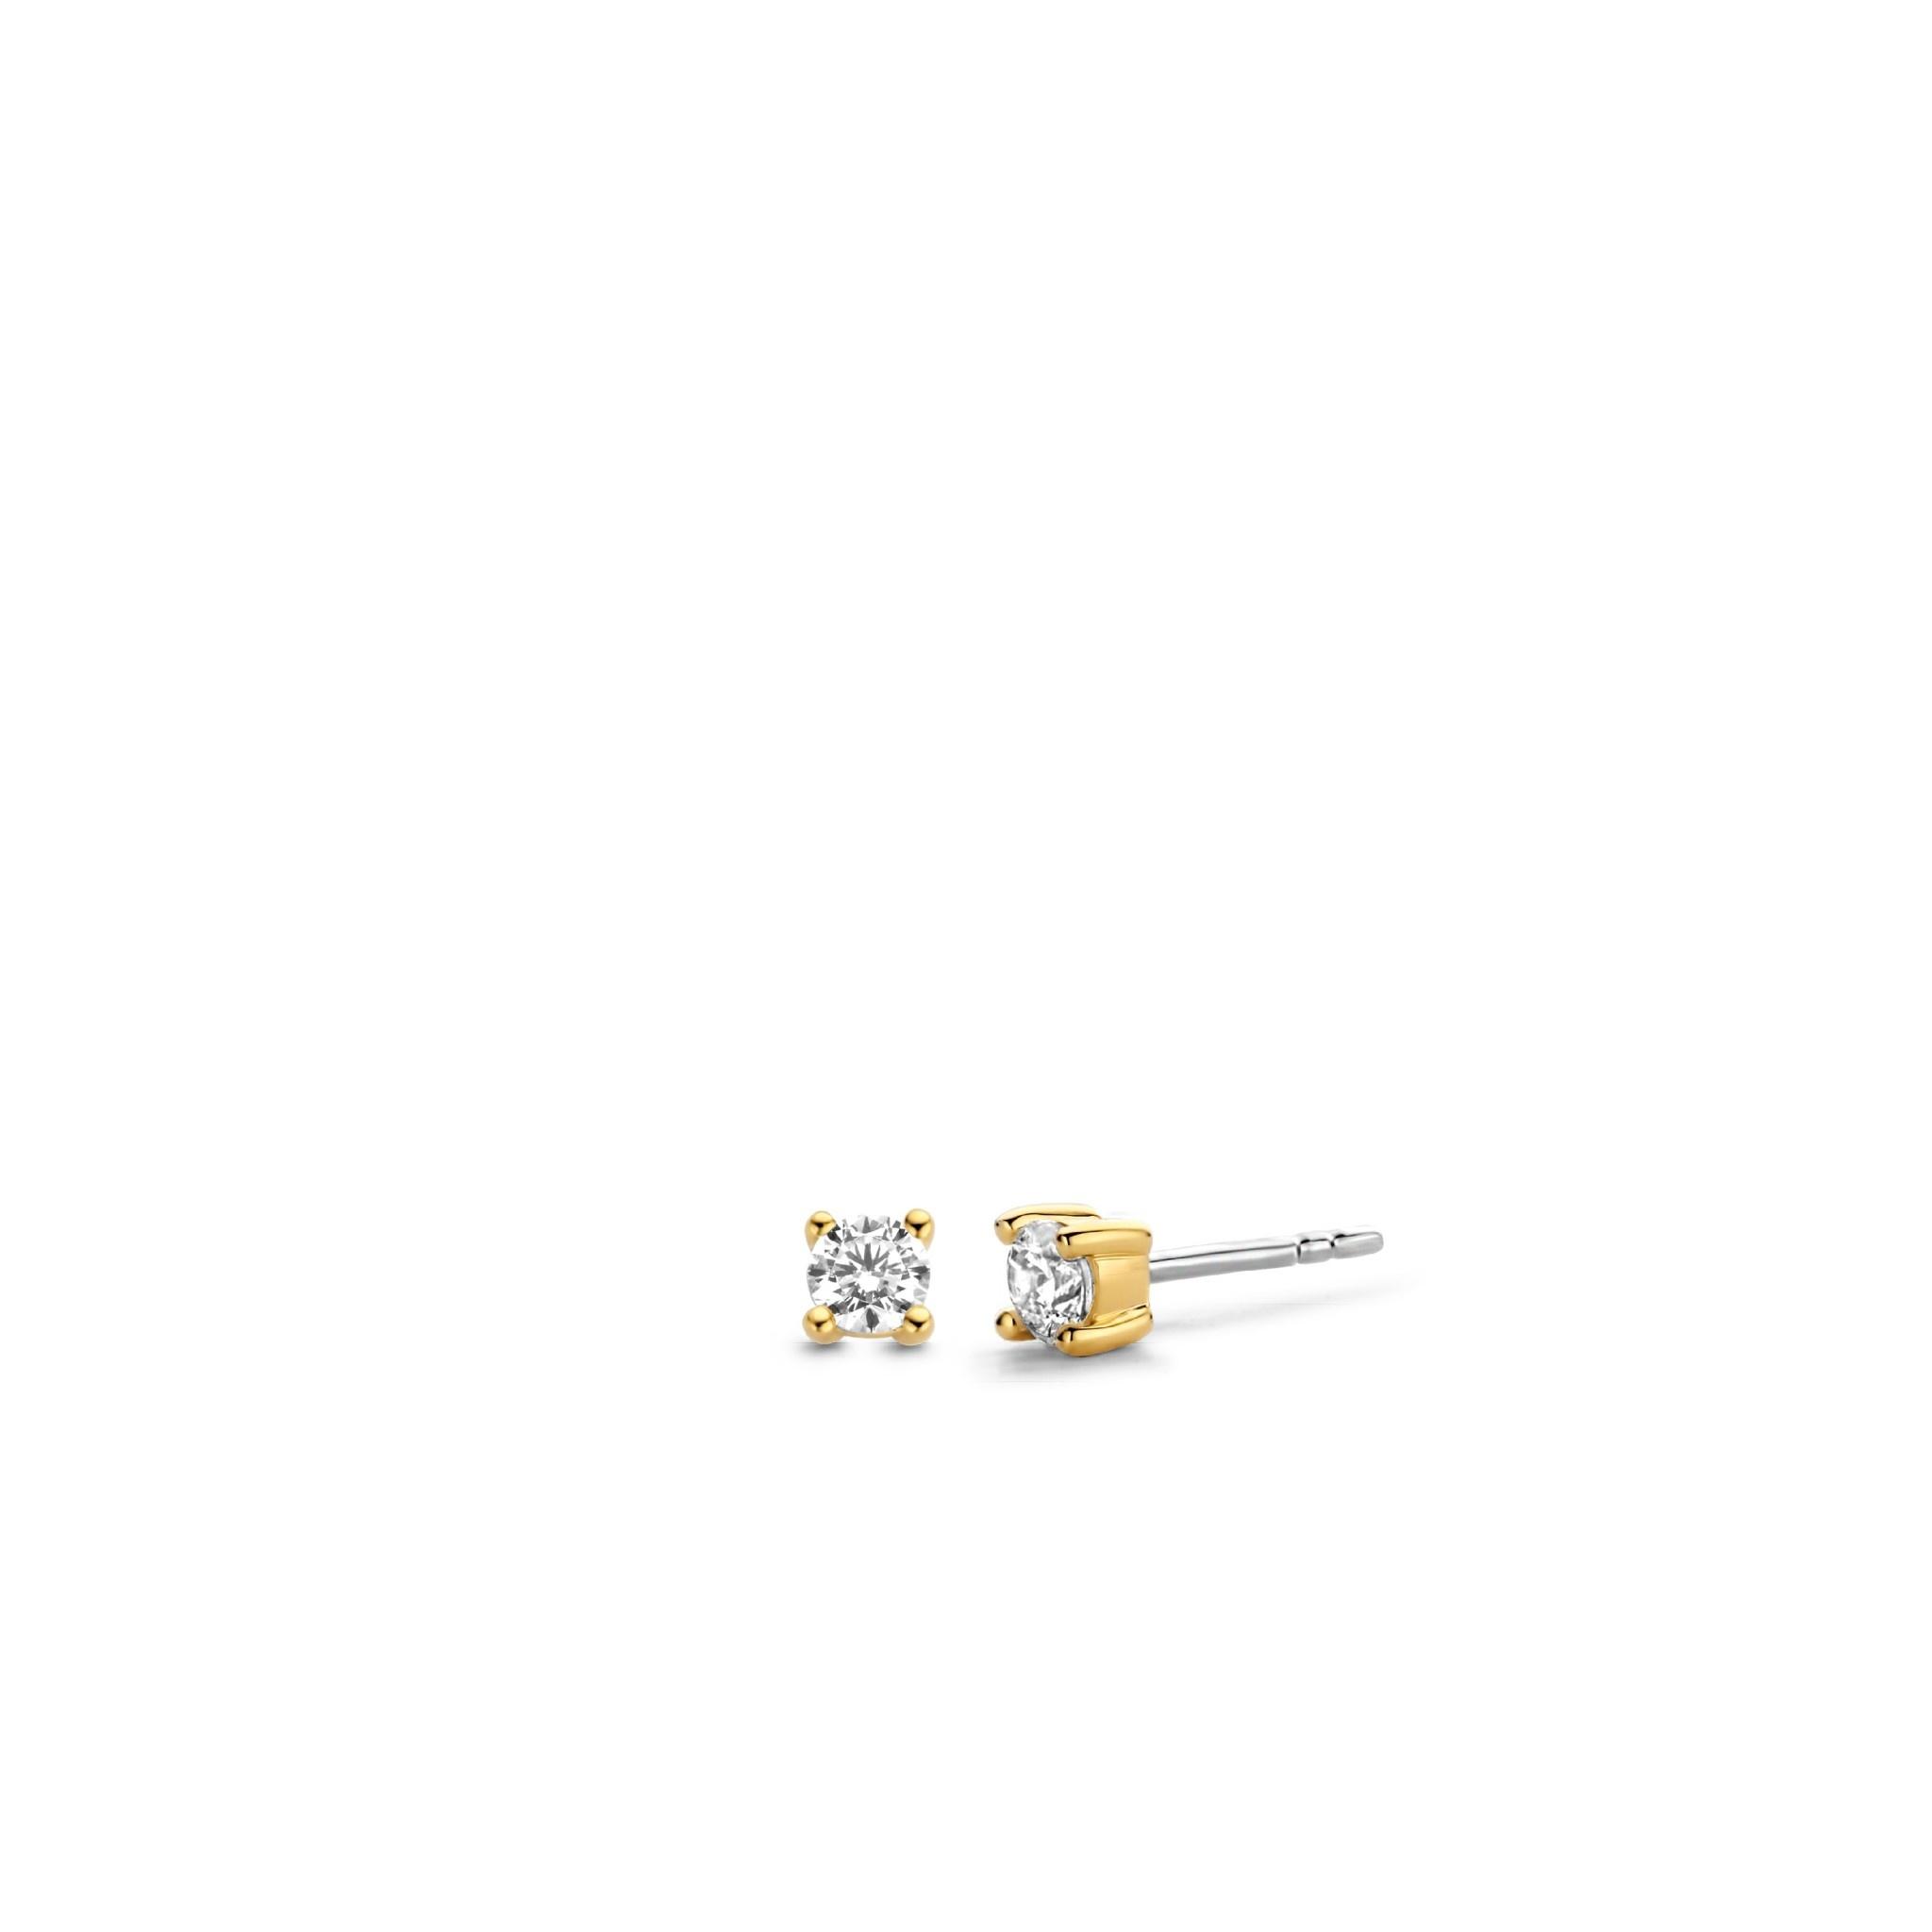 TI SENTO - Milano Earrings 7836ZY-1